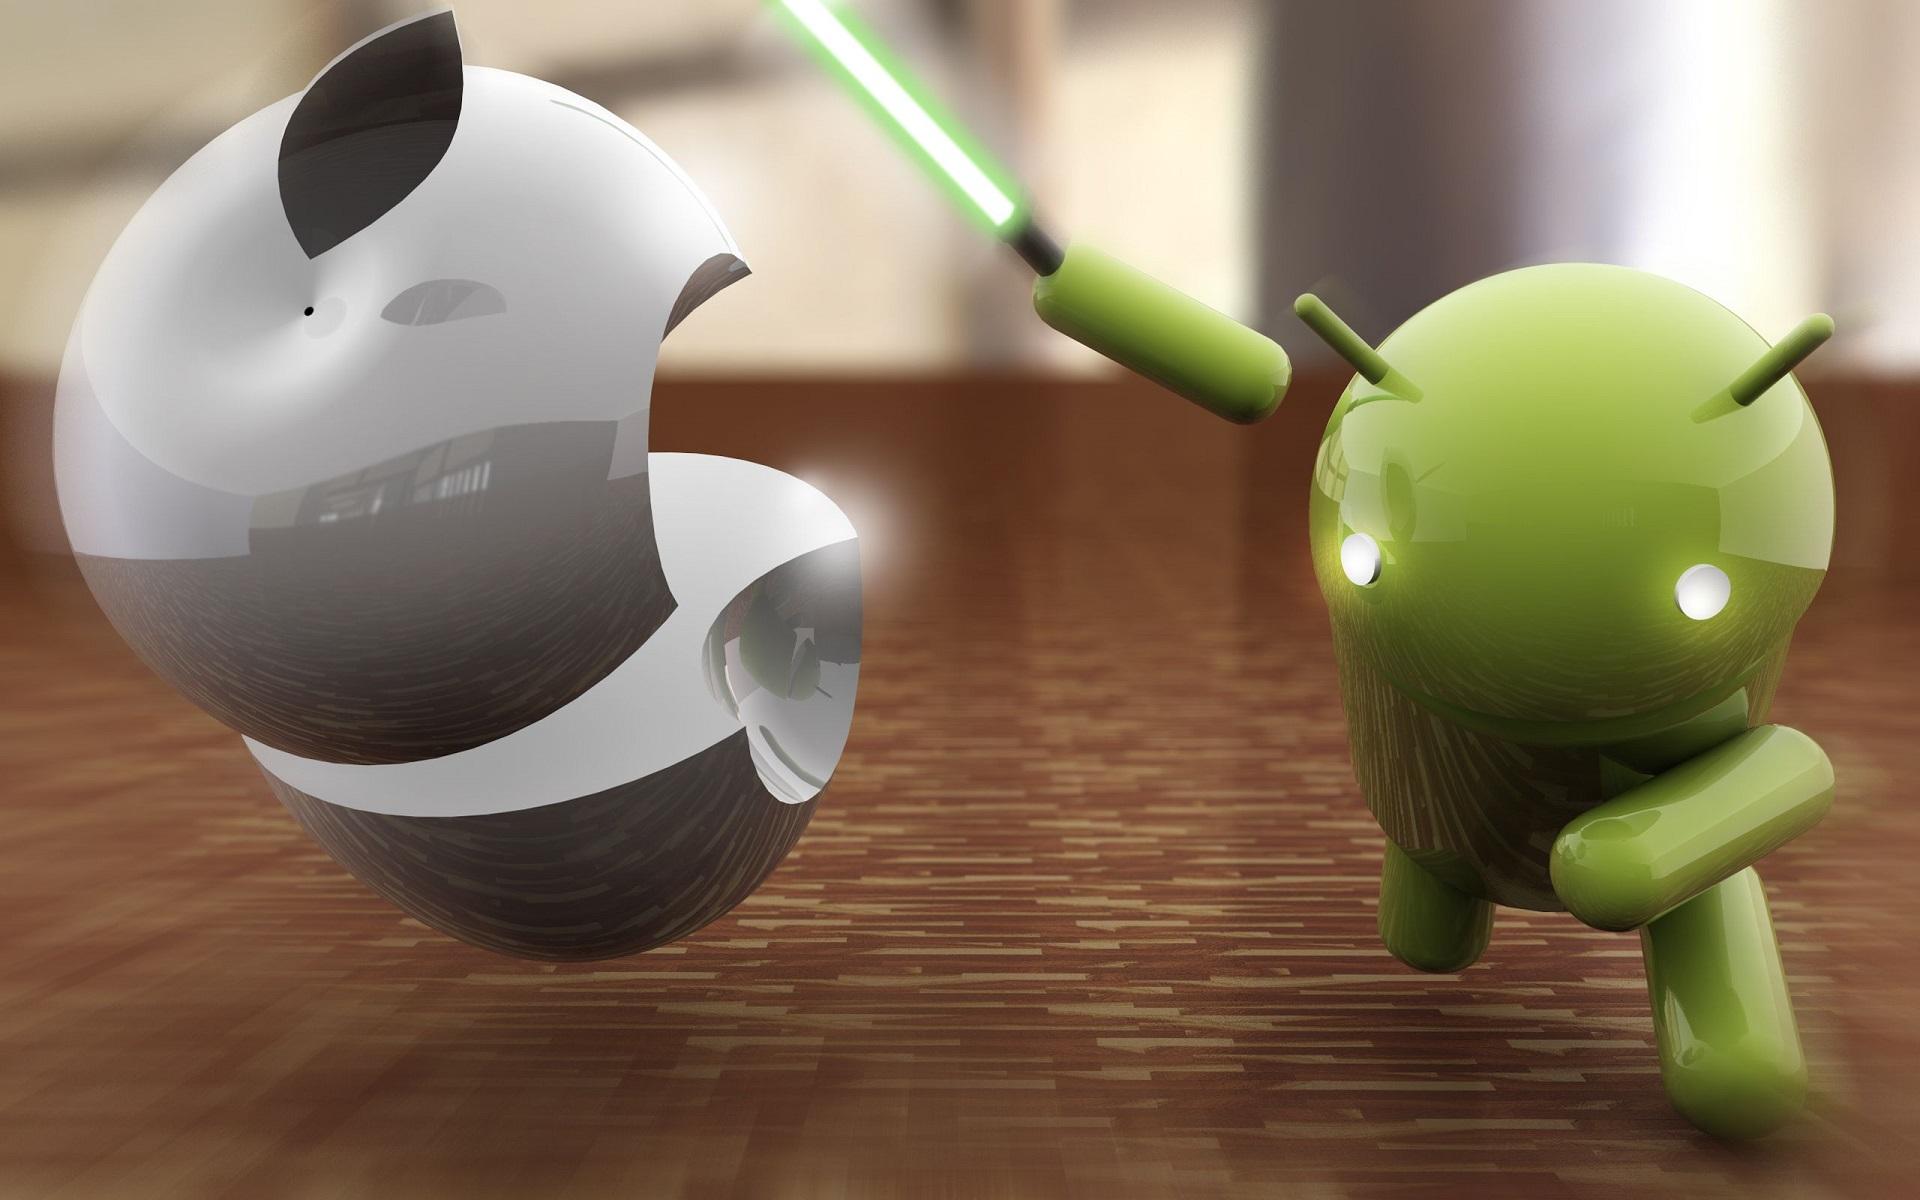 Android 操作系统,祝你祝你13岁生日快乐